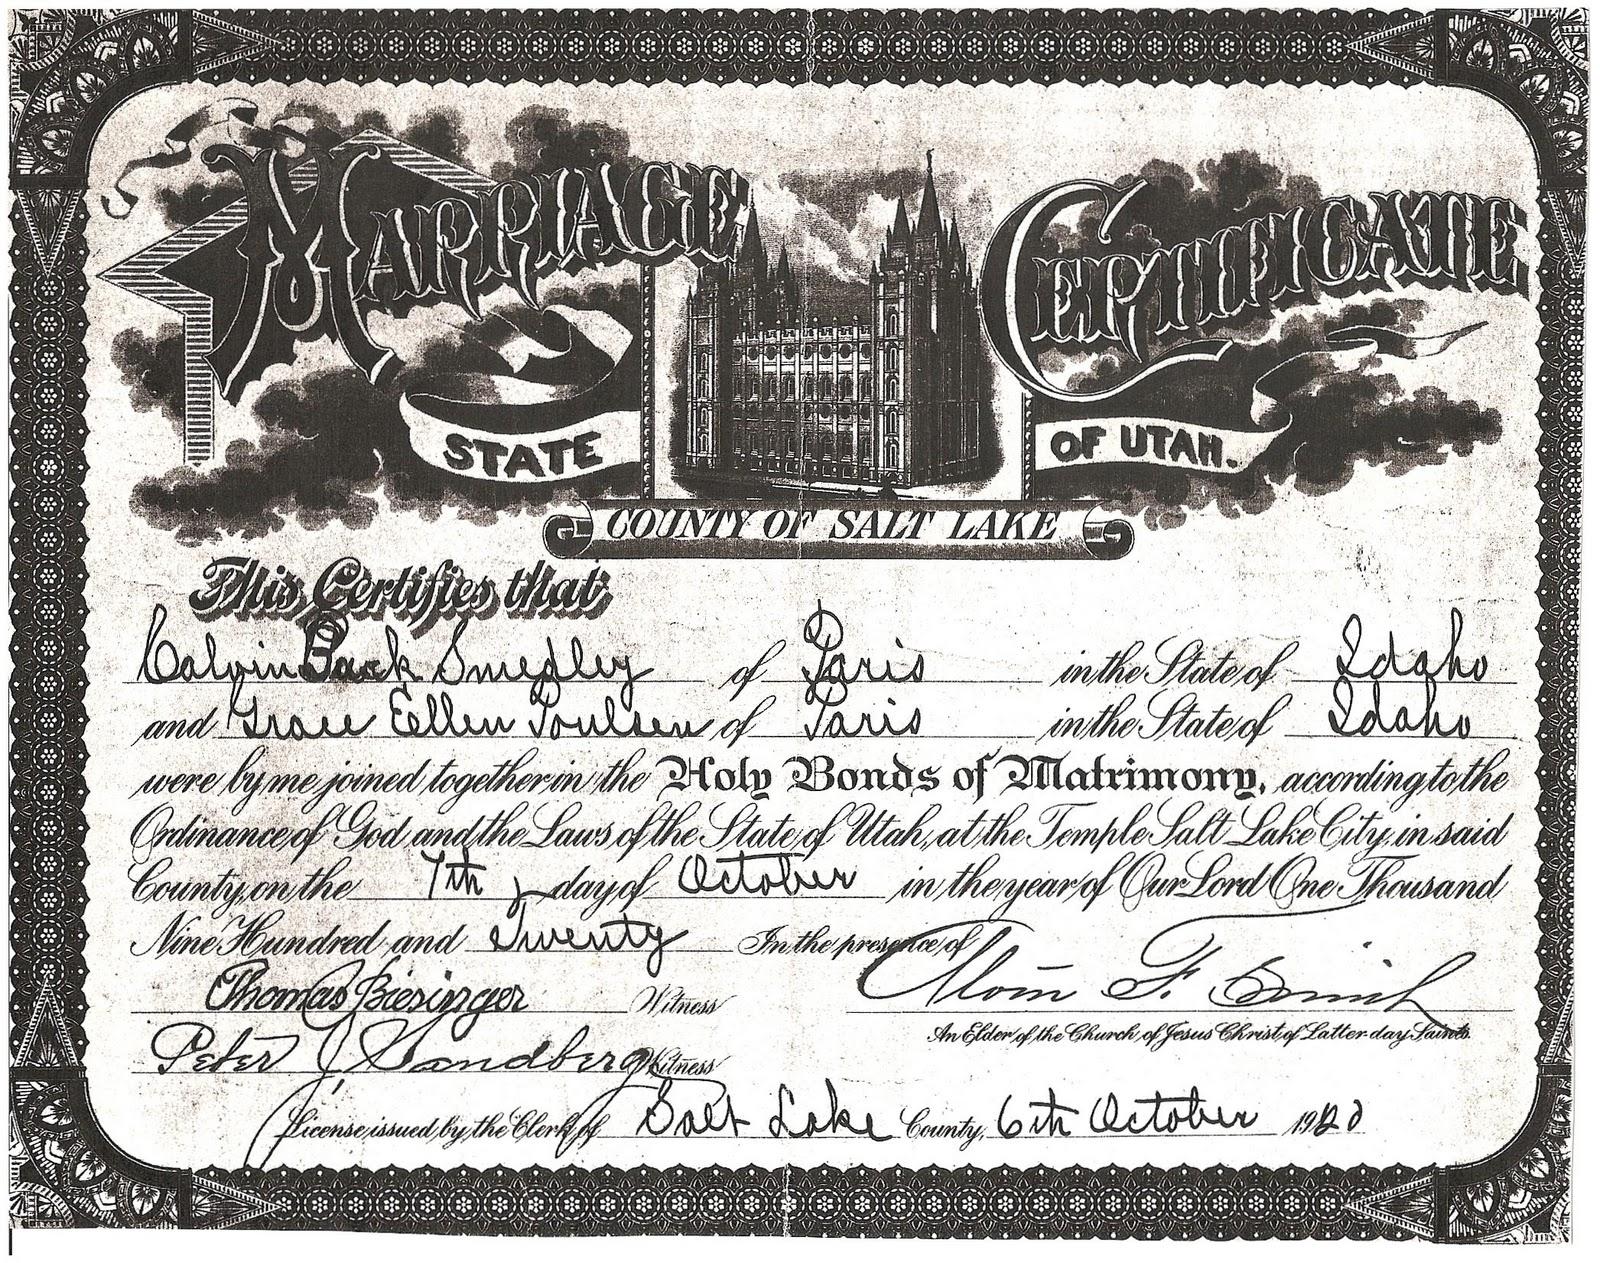 Ancestors live here wedding wednesday smedley marriage certificate wedding wednesday smedley marriage certificate 1betcityfo Image collections